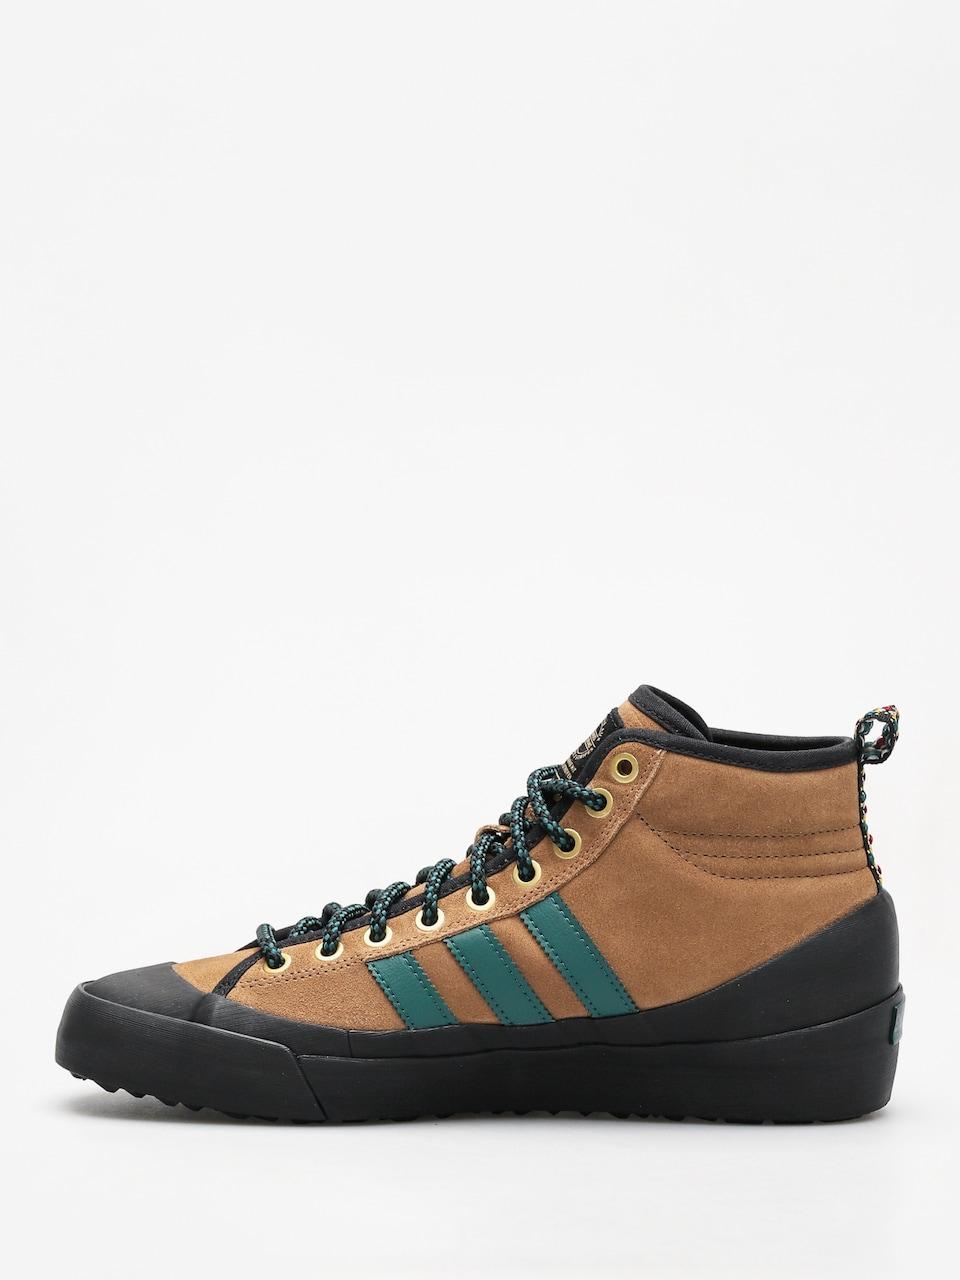 Adidas Matchcourt High RX3 Skate Shoes